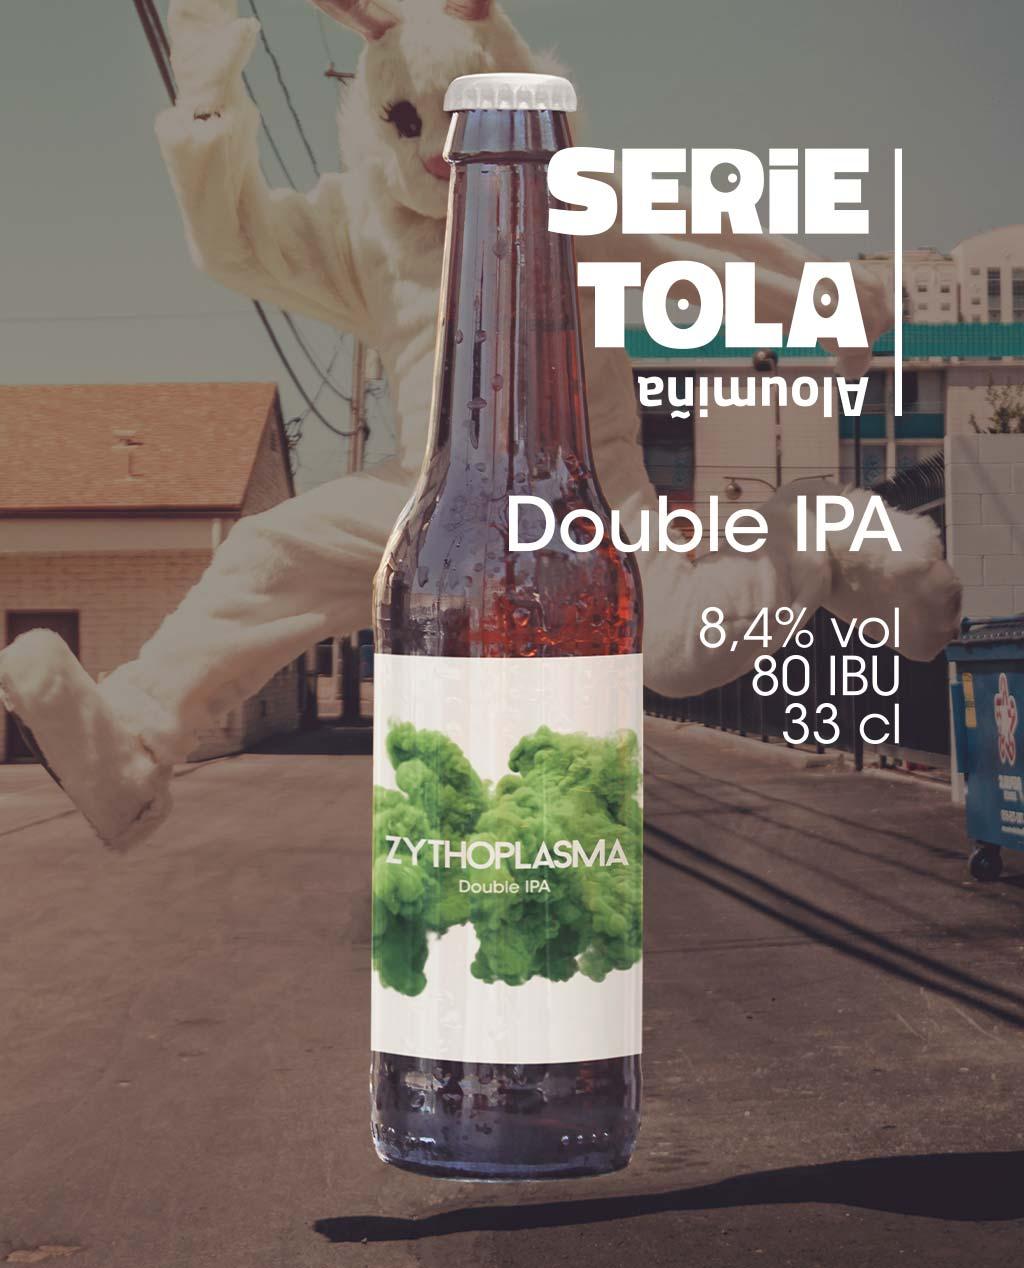 aloumina-cervexa-artesana-craft-beer-caja-variada-serietola-frikisatope-Zythoplasma-1024×1268-000